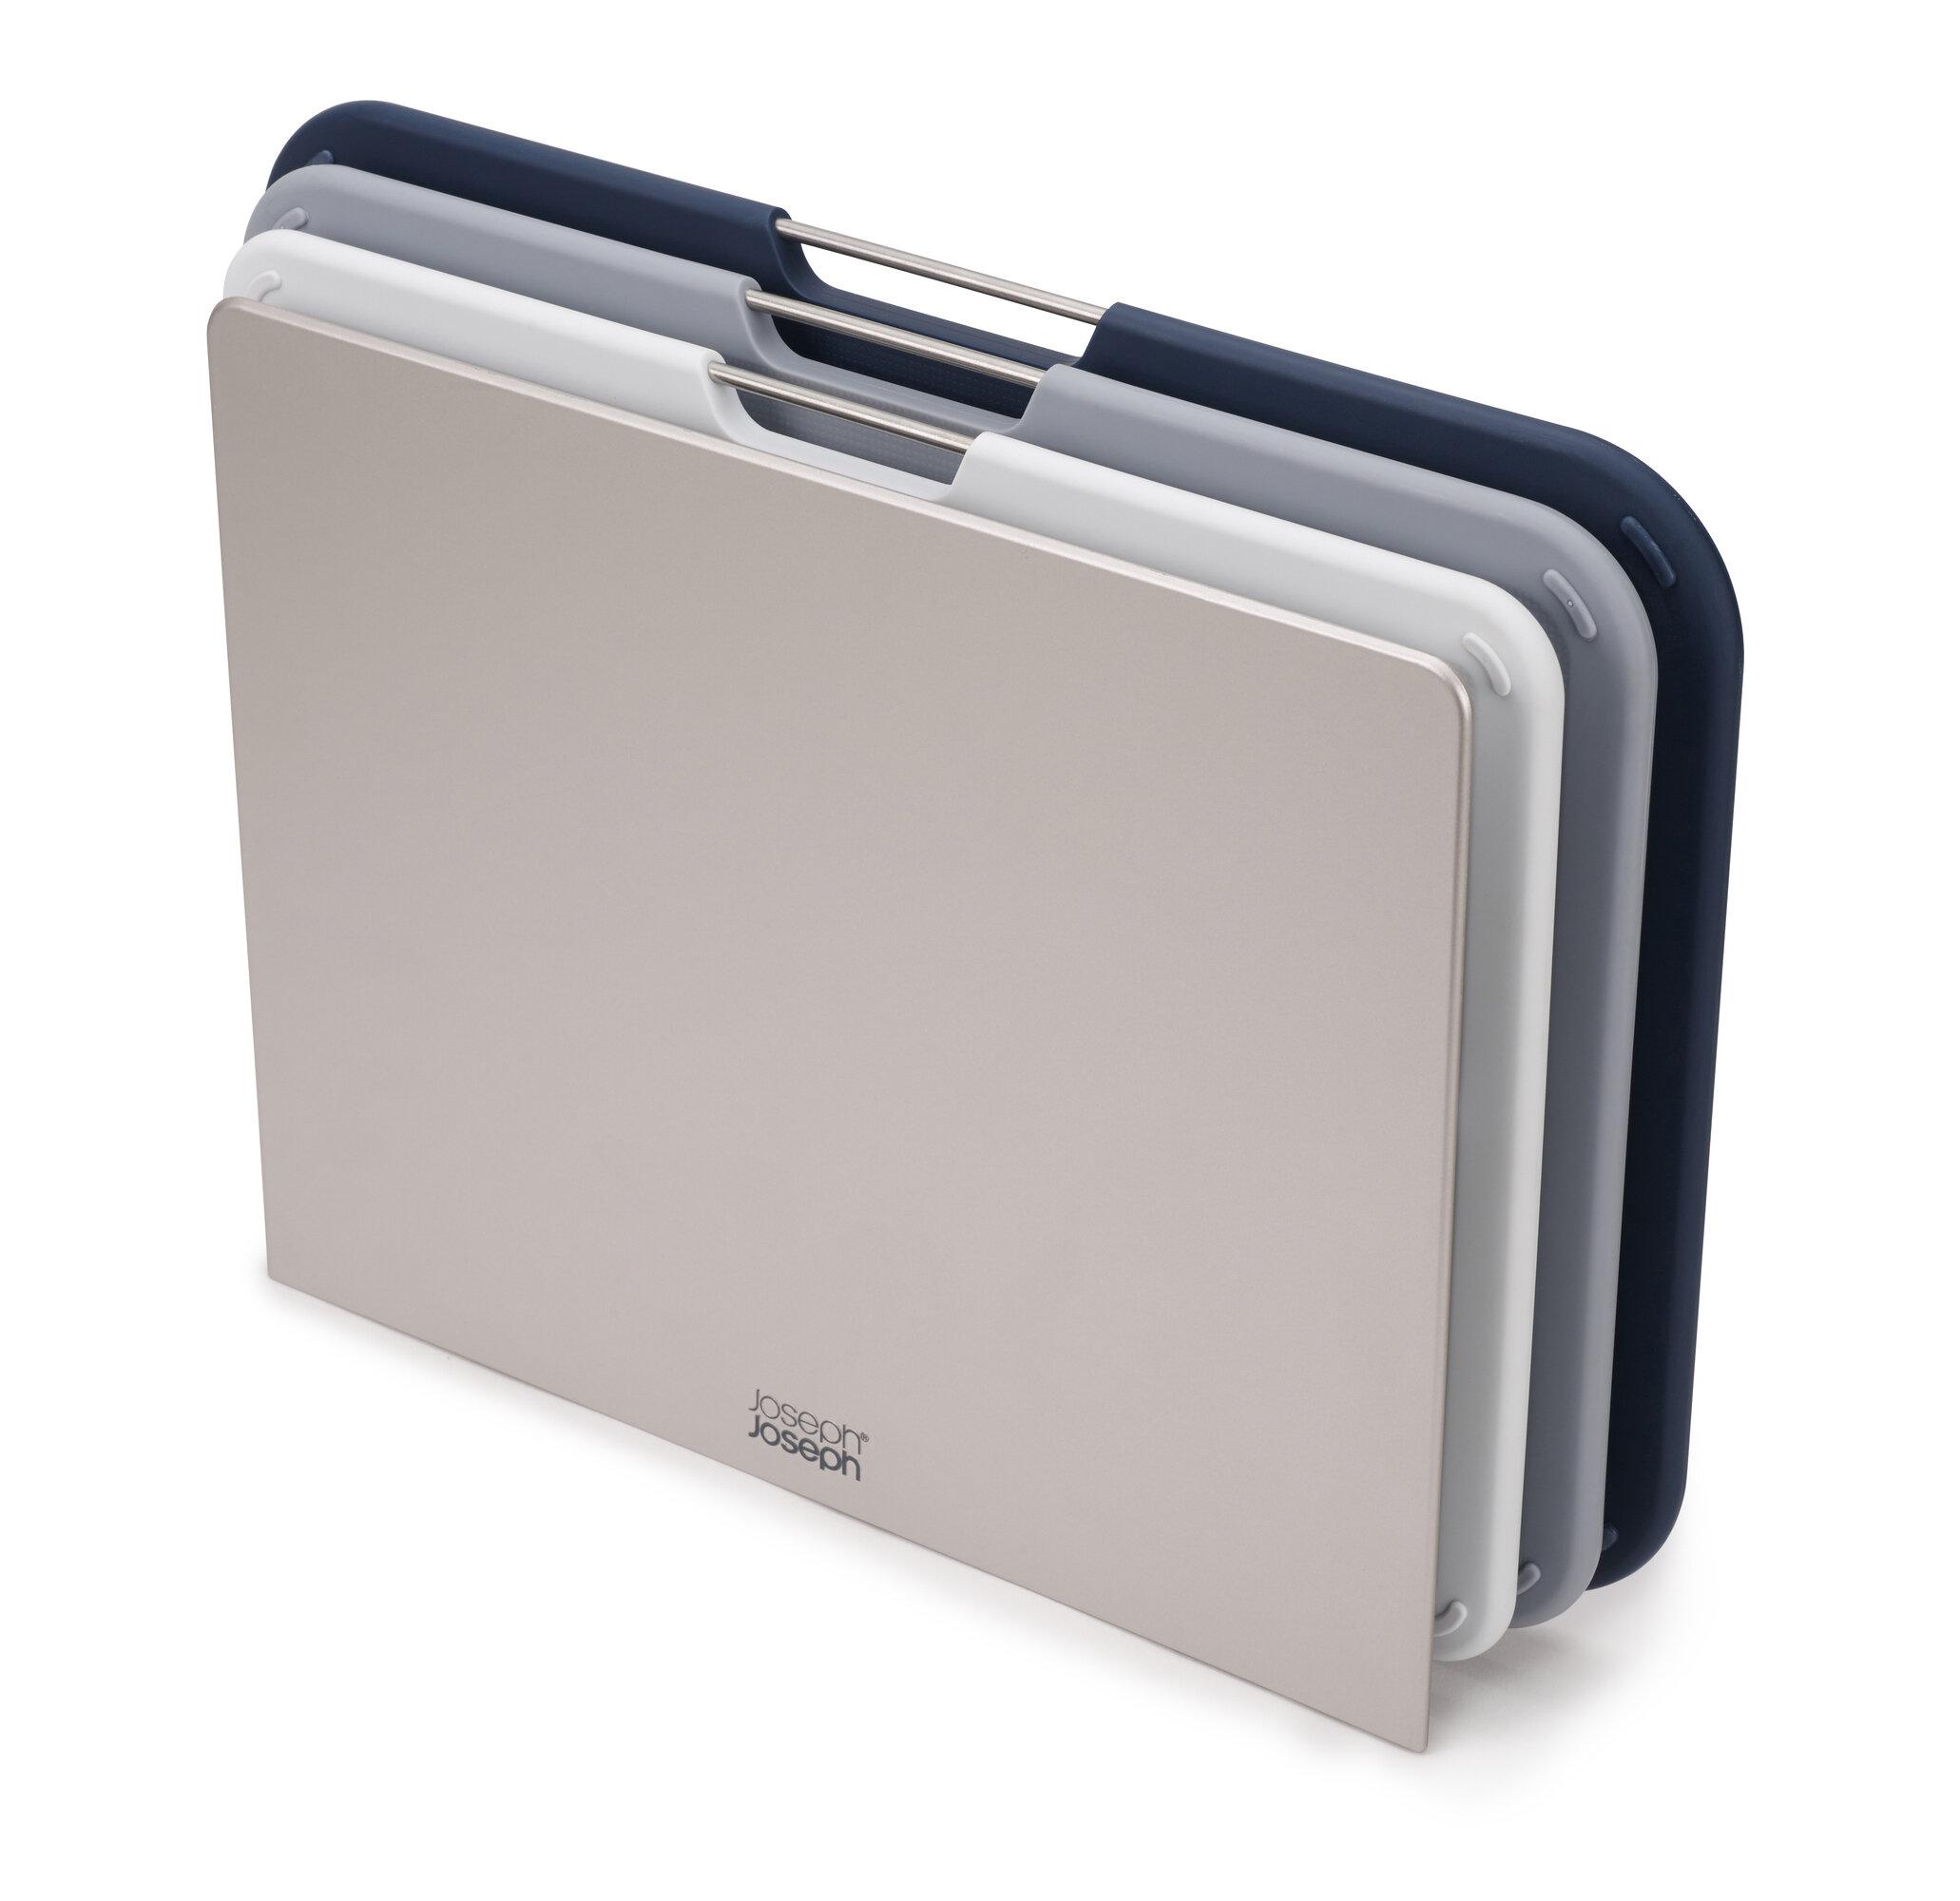 Joseph Joseph Nest Plastic Cutting Board Set With Storage Stand 3 Different Sized Boards Gray Regular Reviews Wayfair